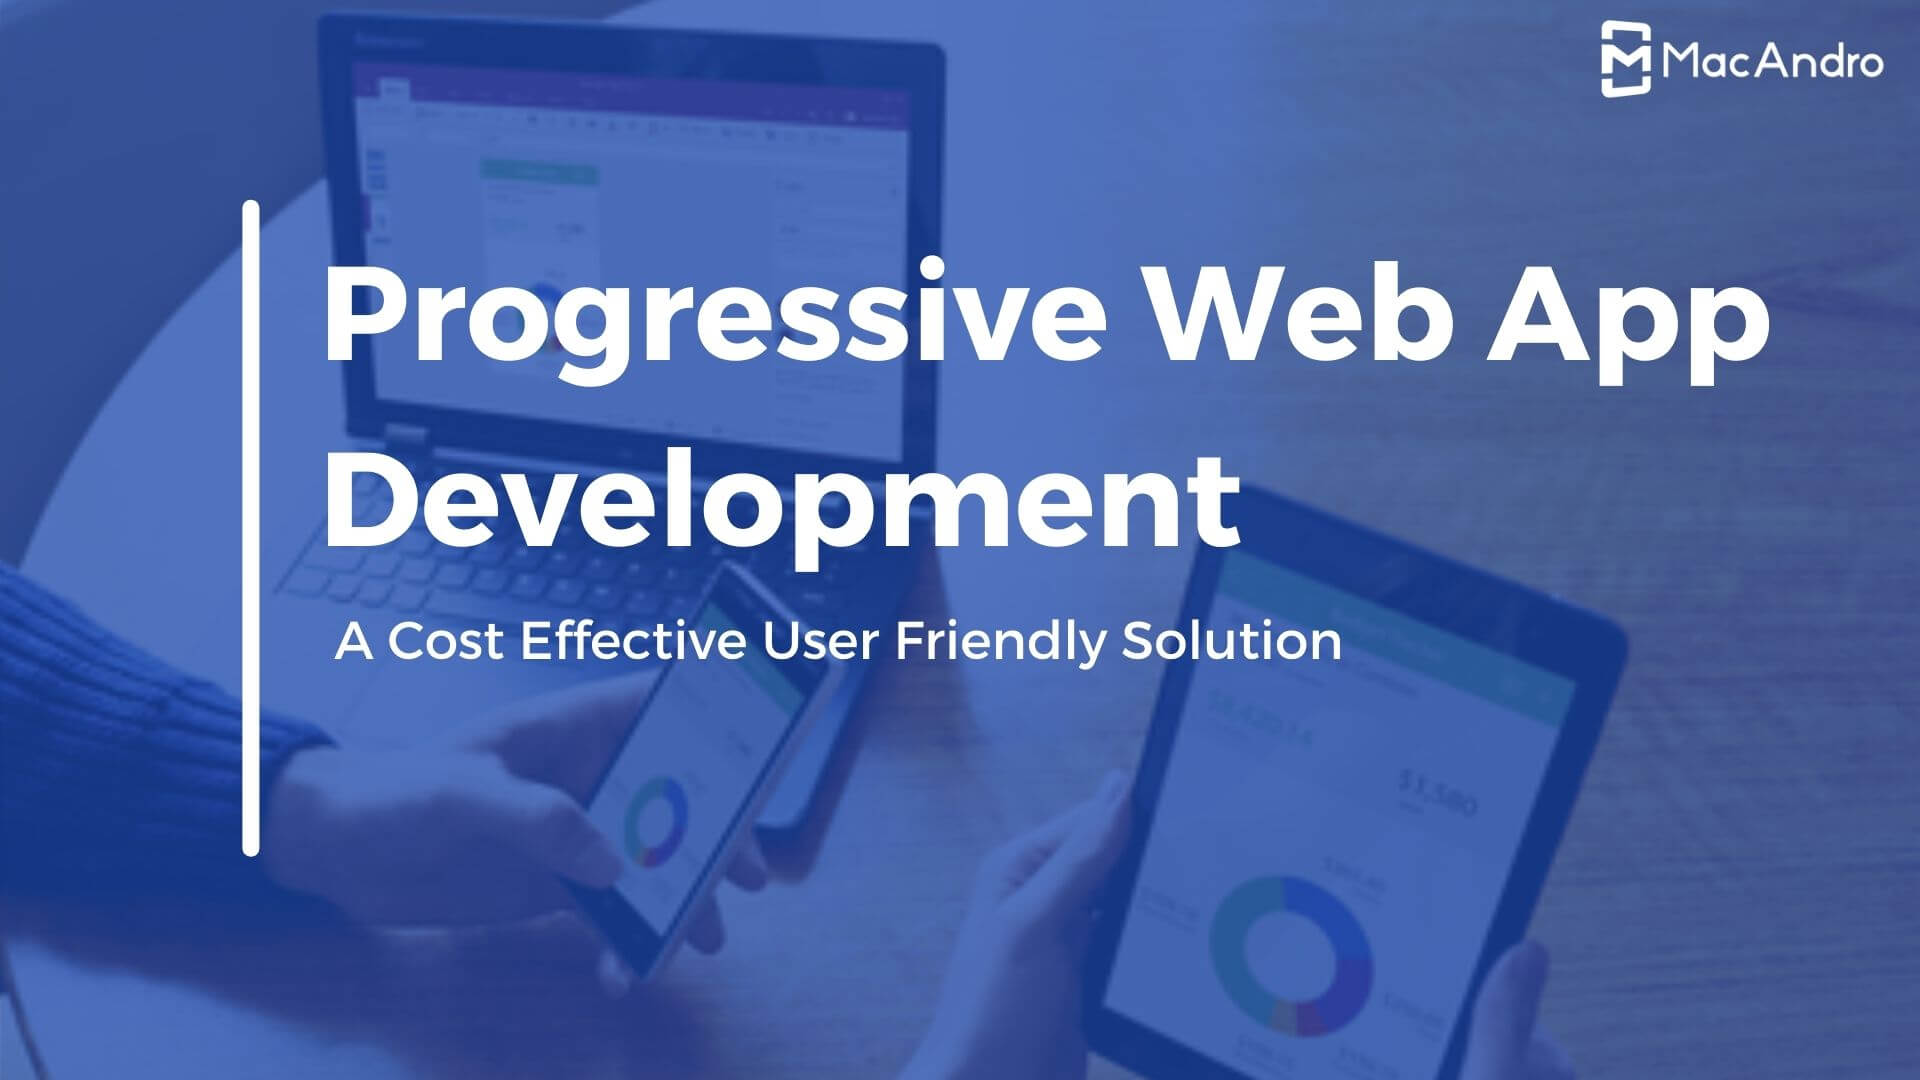 Progressive Web App Development - The Future of Online Businesses